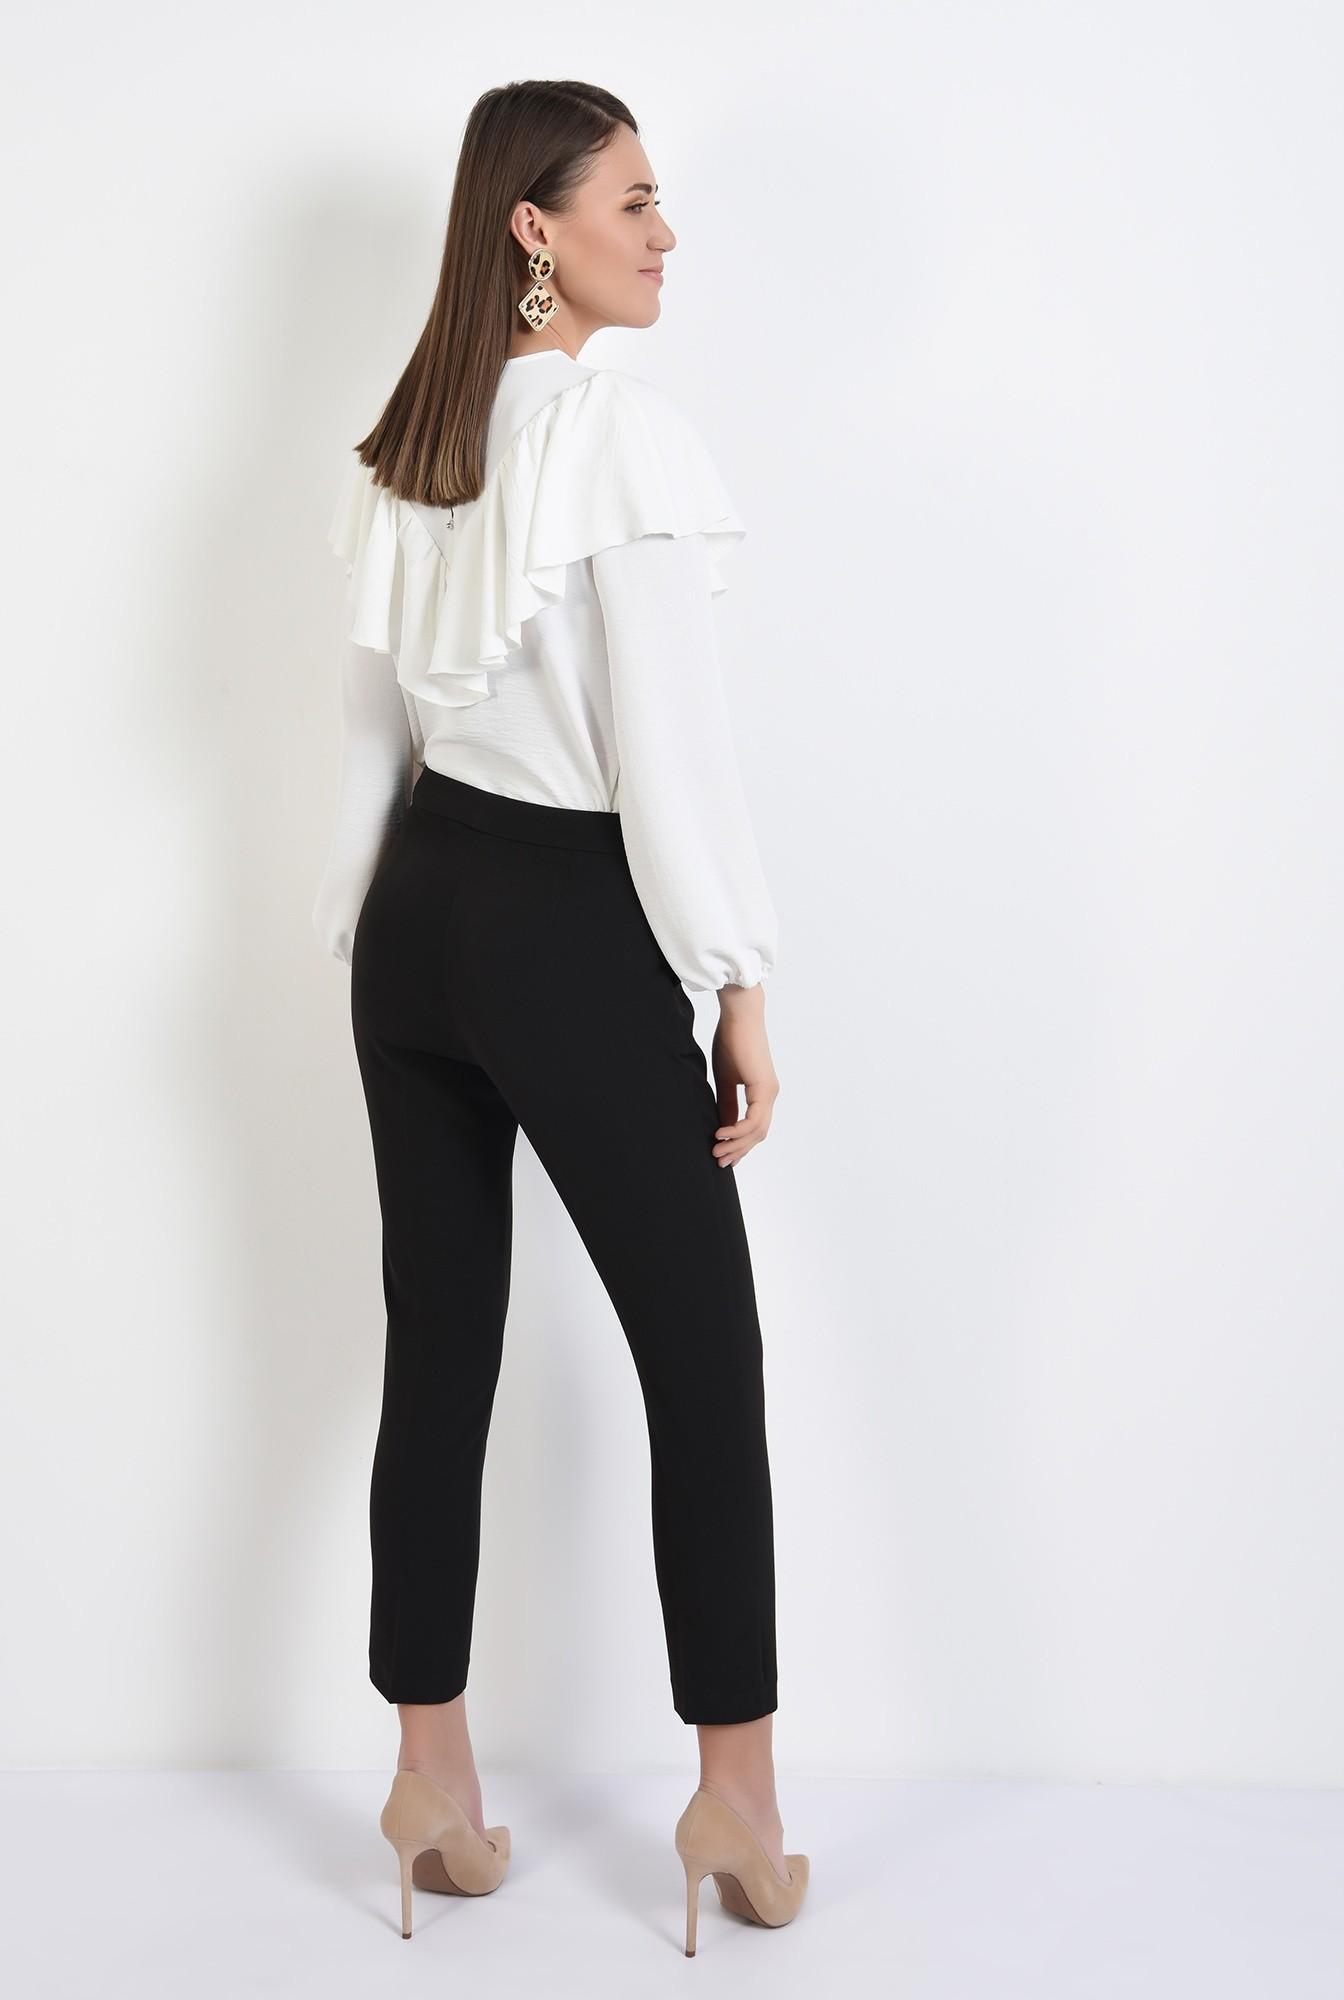 1 - bluza casual, cu platca, volan, maneci bufante, alb, bluza de primavara